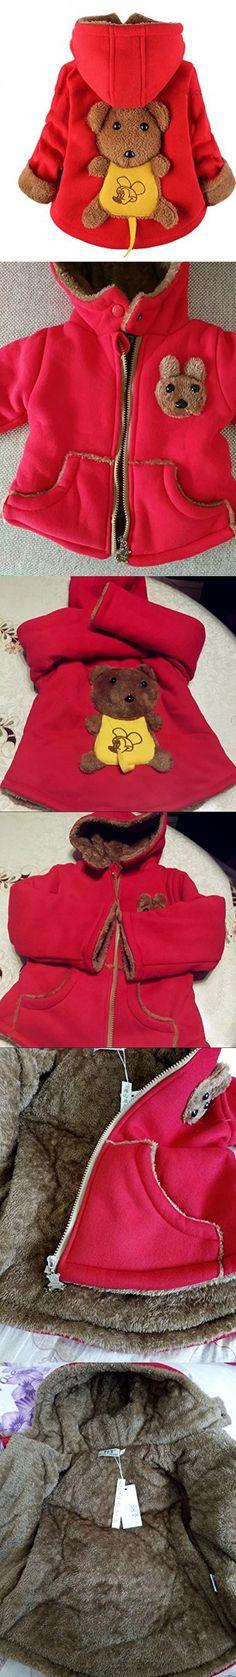 dbb67c7cd Coper Fashion Baby Girls Boys Winter Hoodie Down Jacket Warm Coat ...